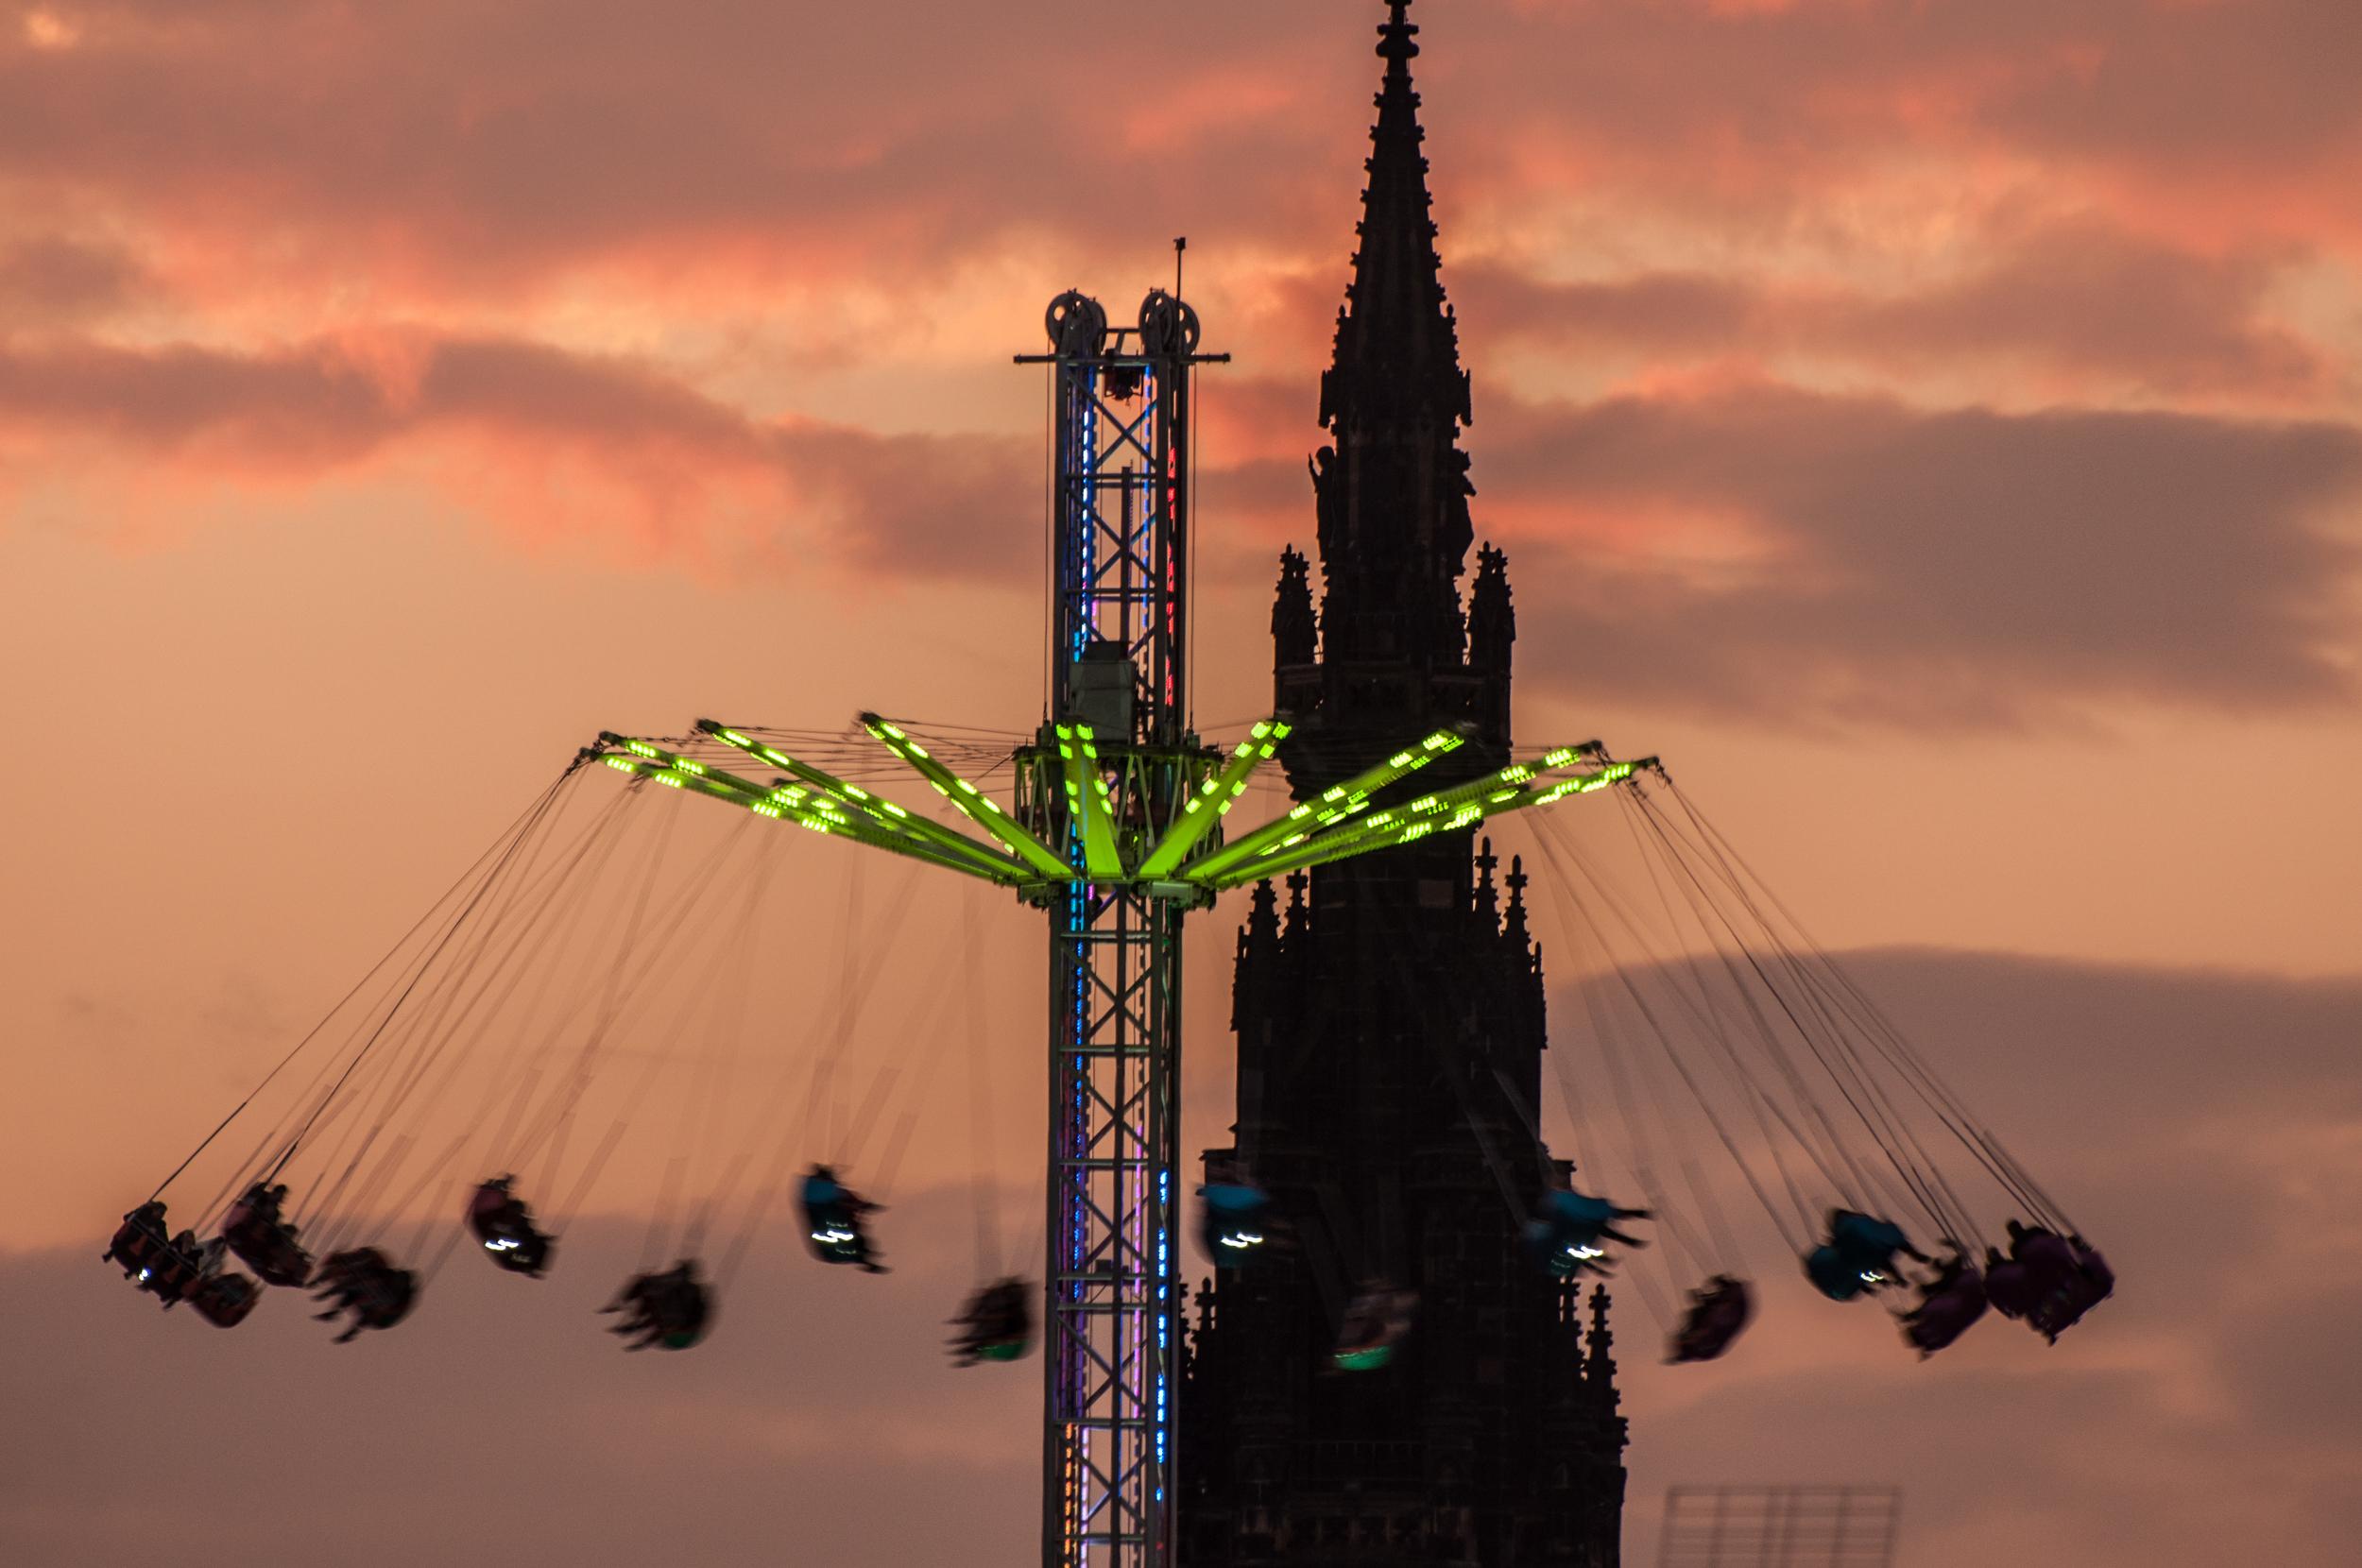 Edinburgh, Szkocja - 141129 - Edinburgh - 141129 - DSC_3177.JPG